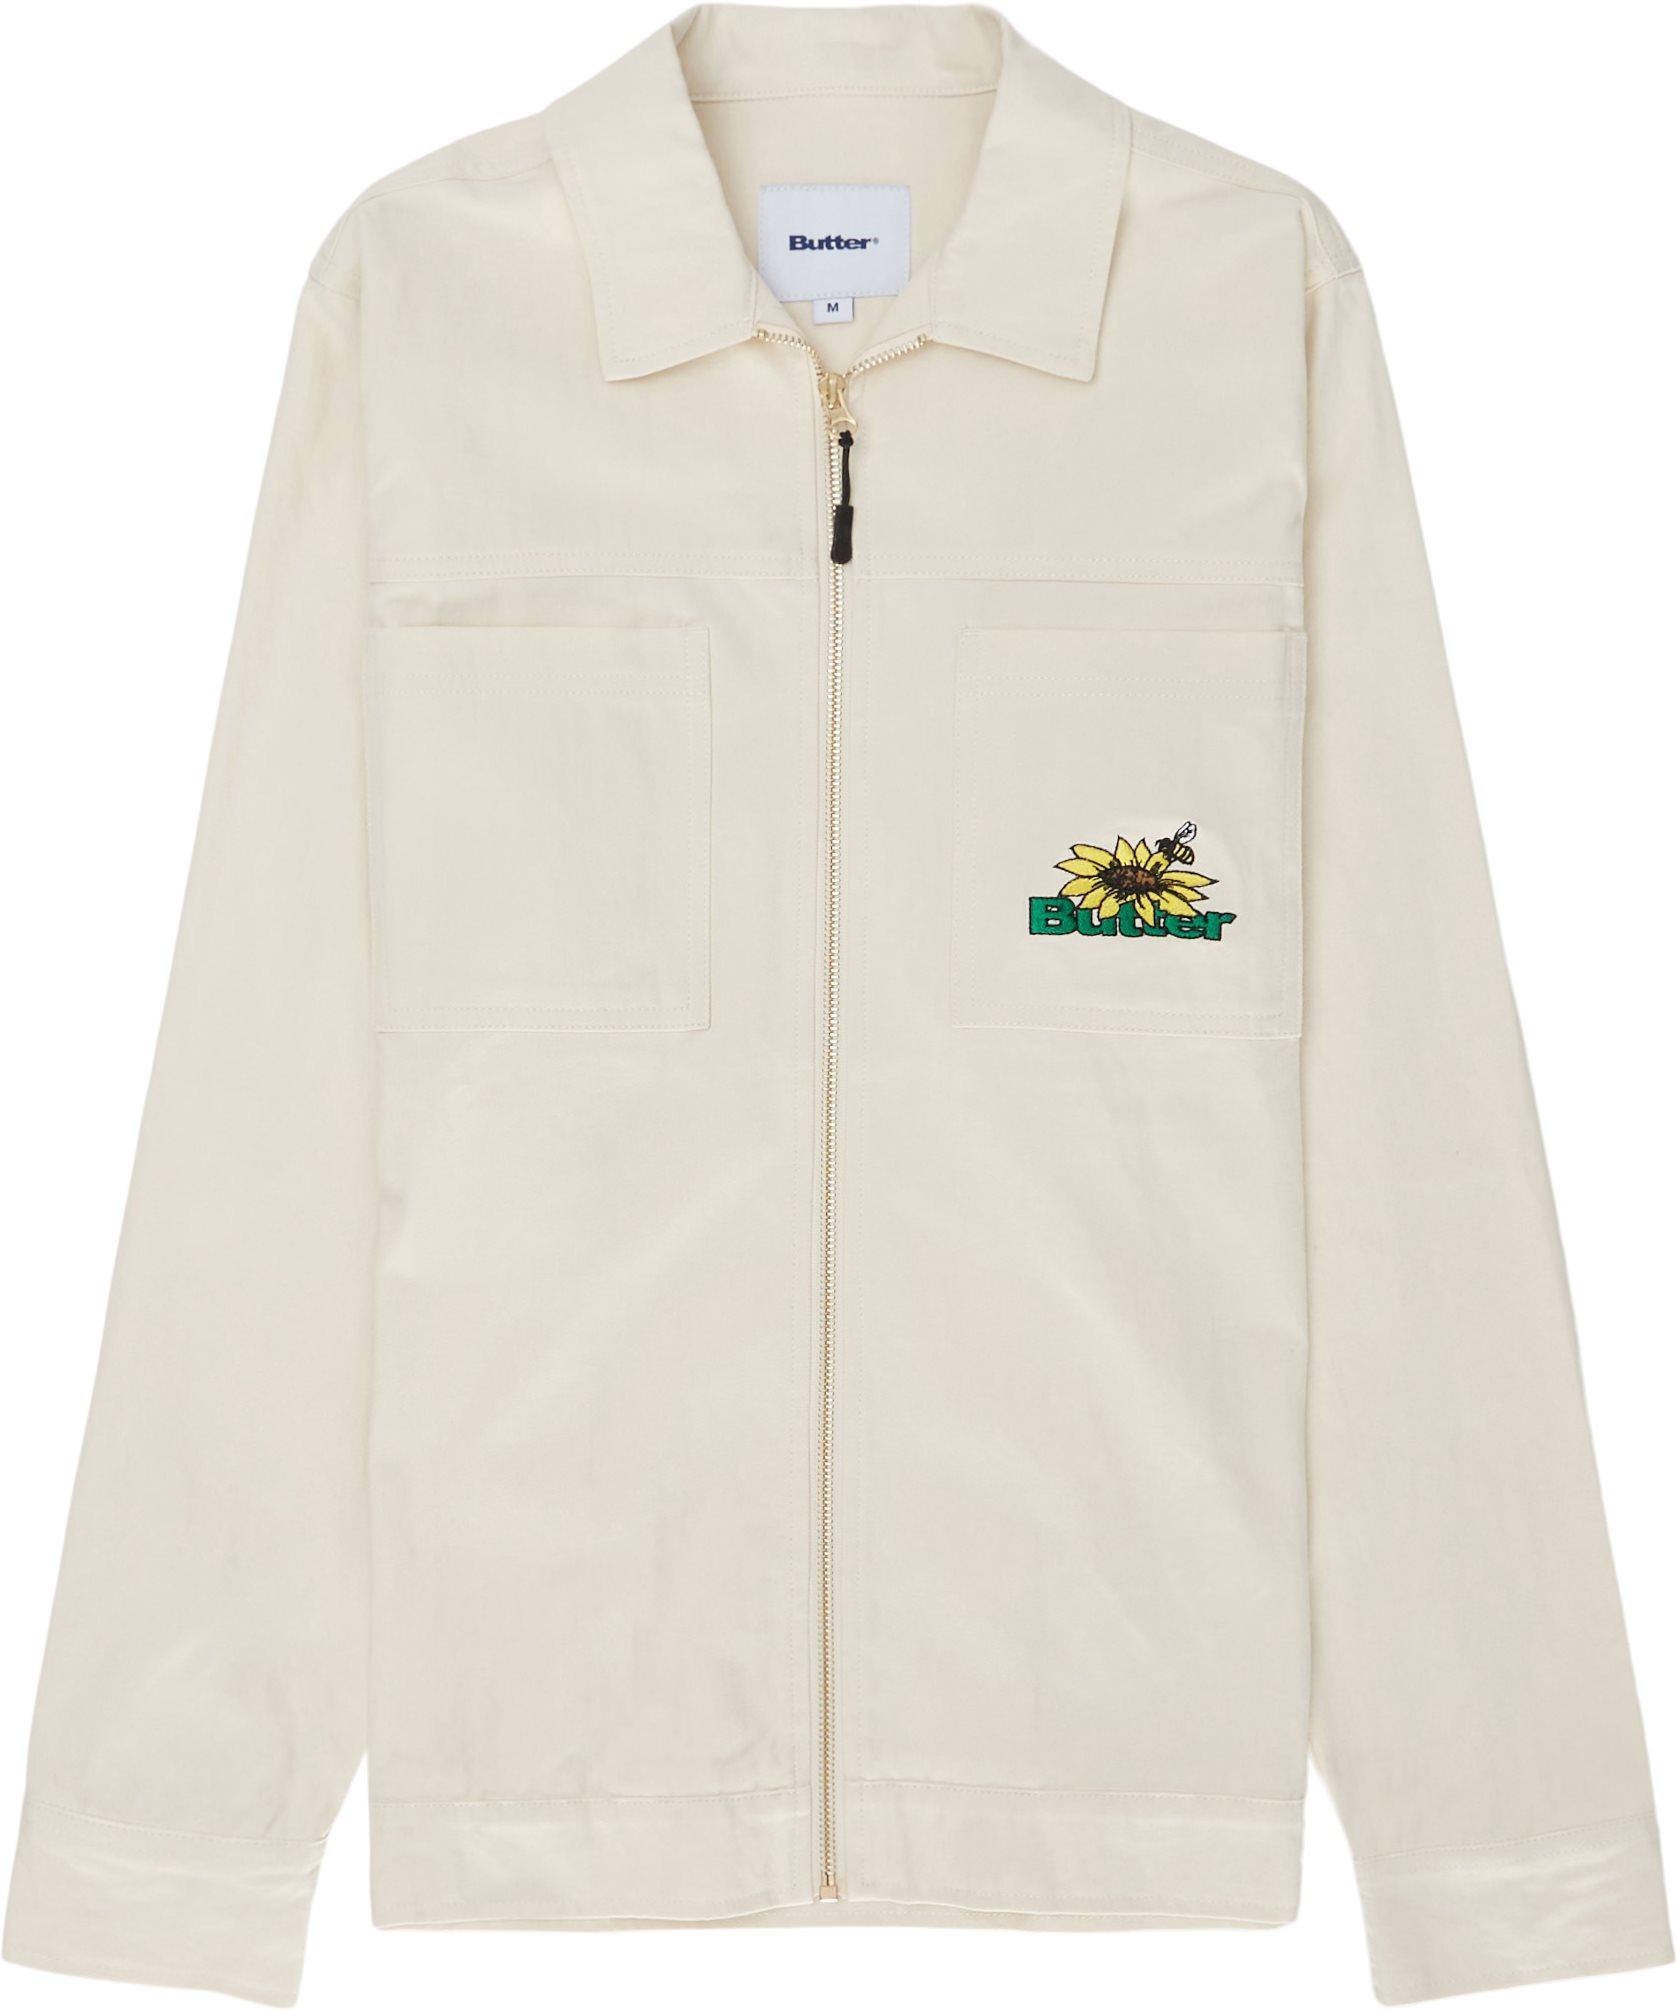 Herringbone Workshirt Skjorte - Skjortor - Regular fit - Vit